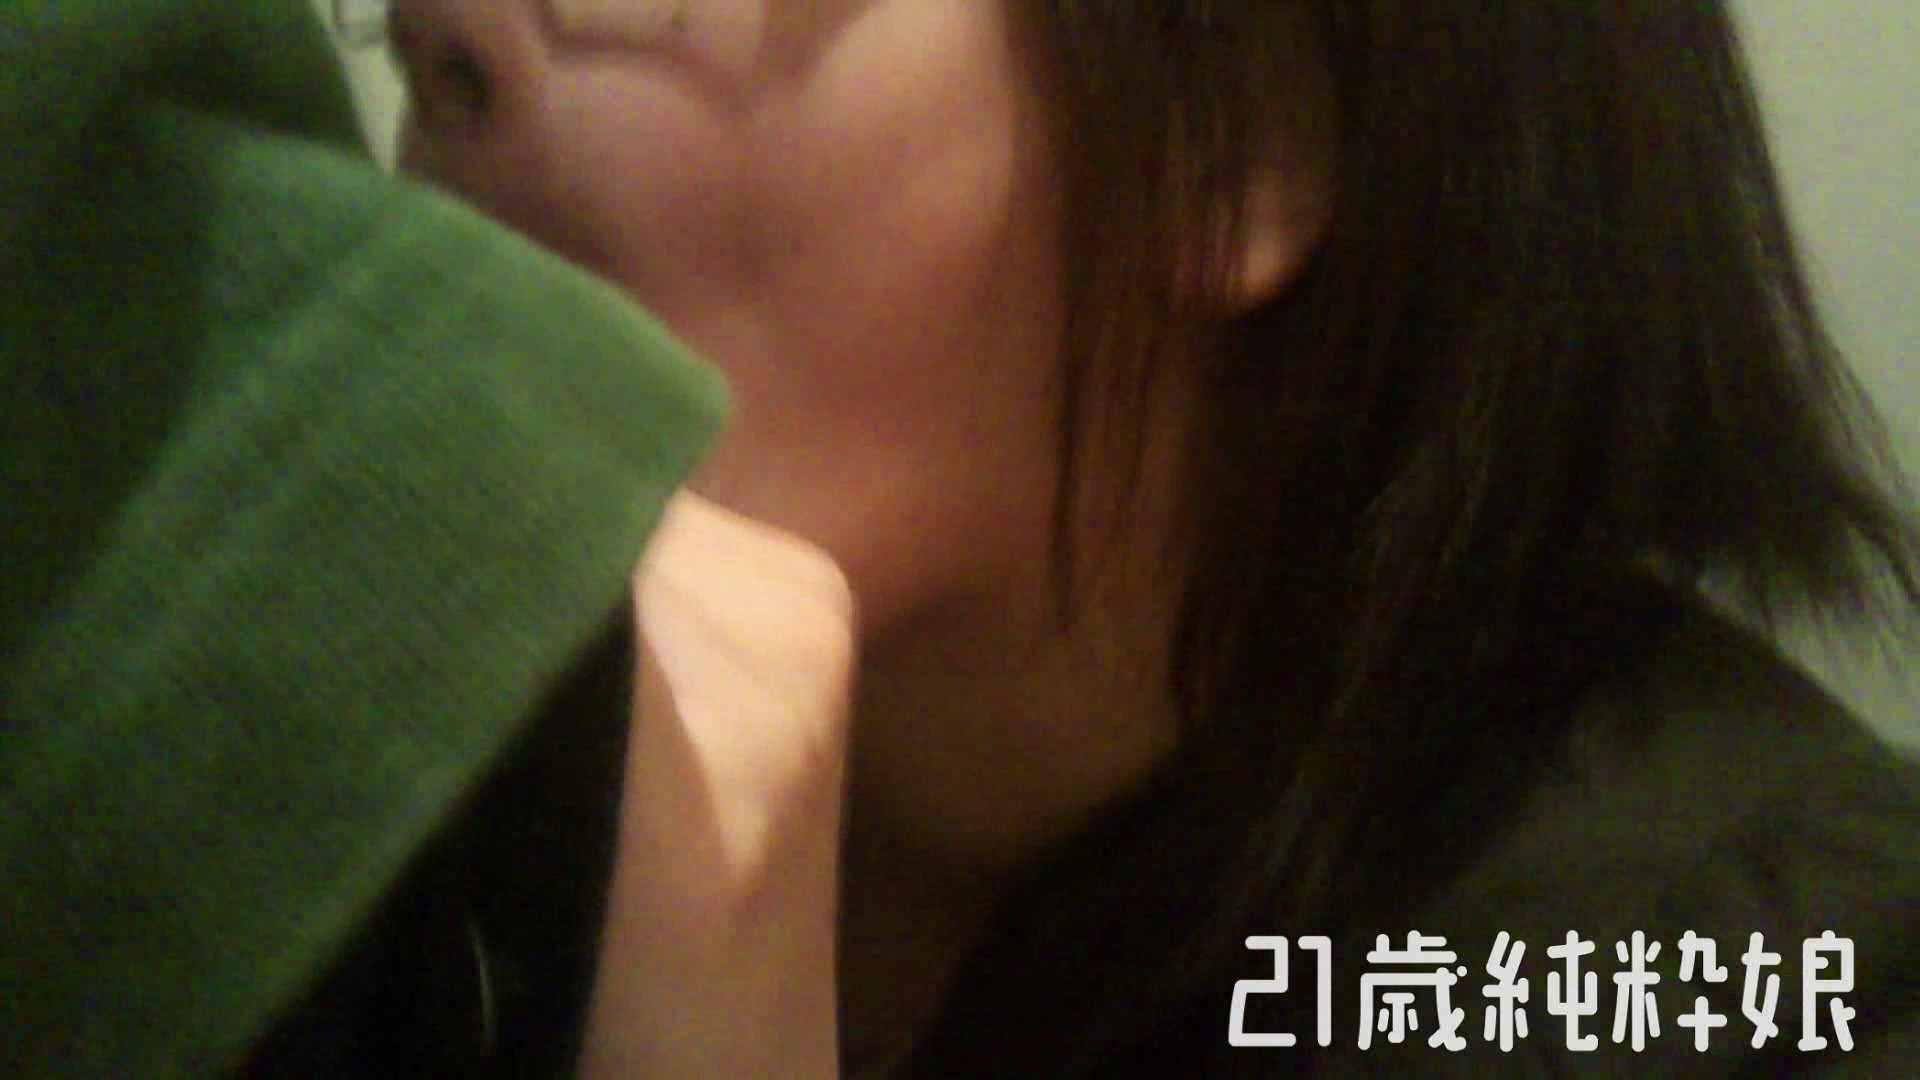 Gカップ21歳純粋嬢第2弾Vol.5 学校 オメコ動画キャプチャ 77pic 35